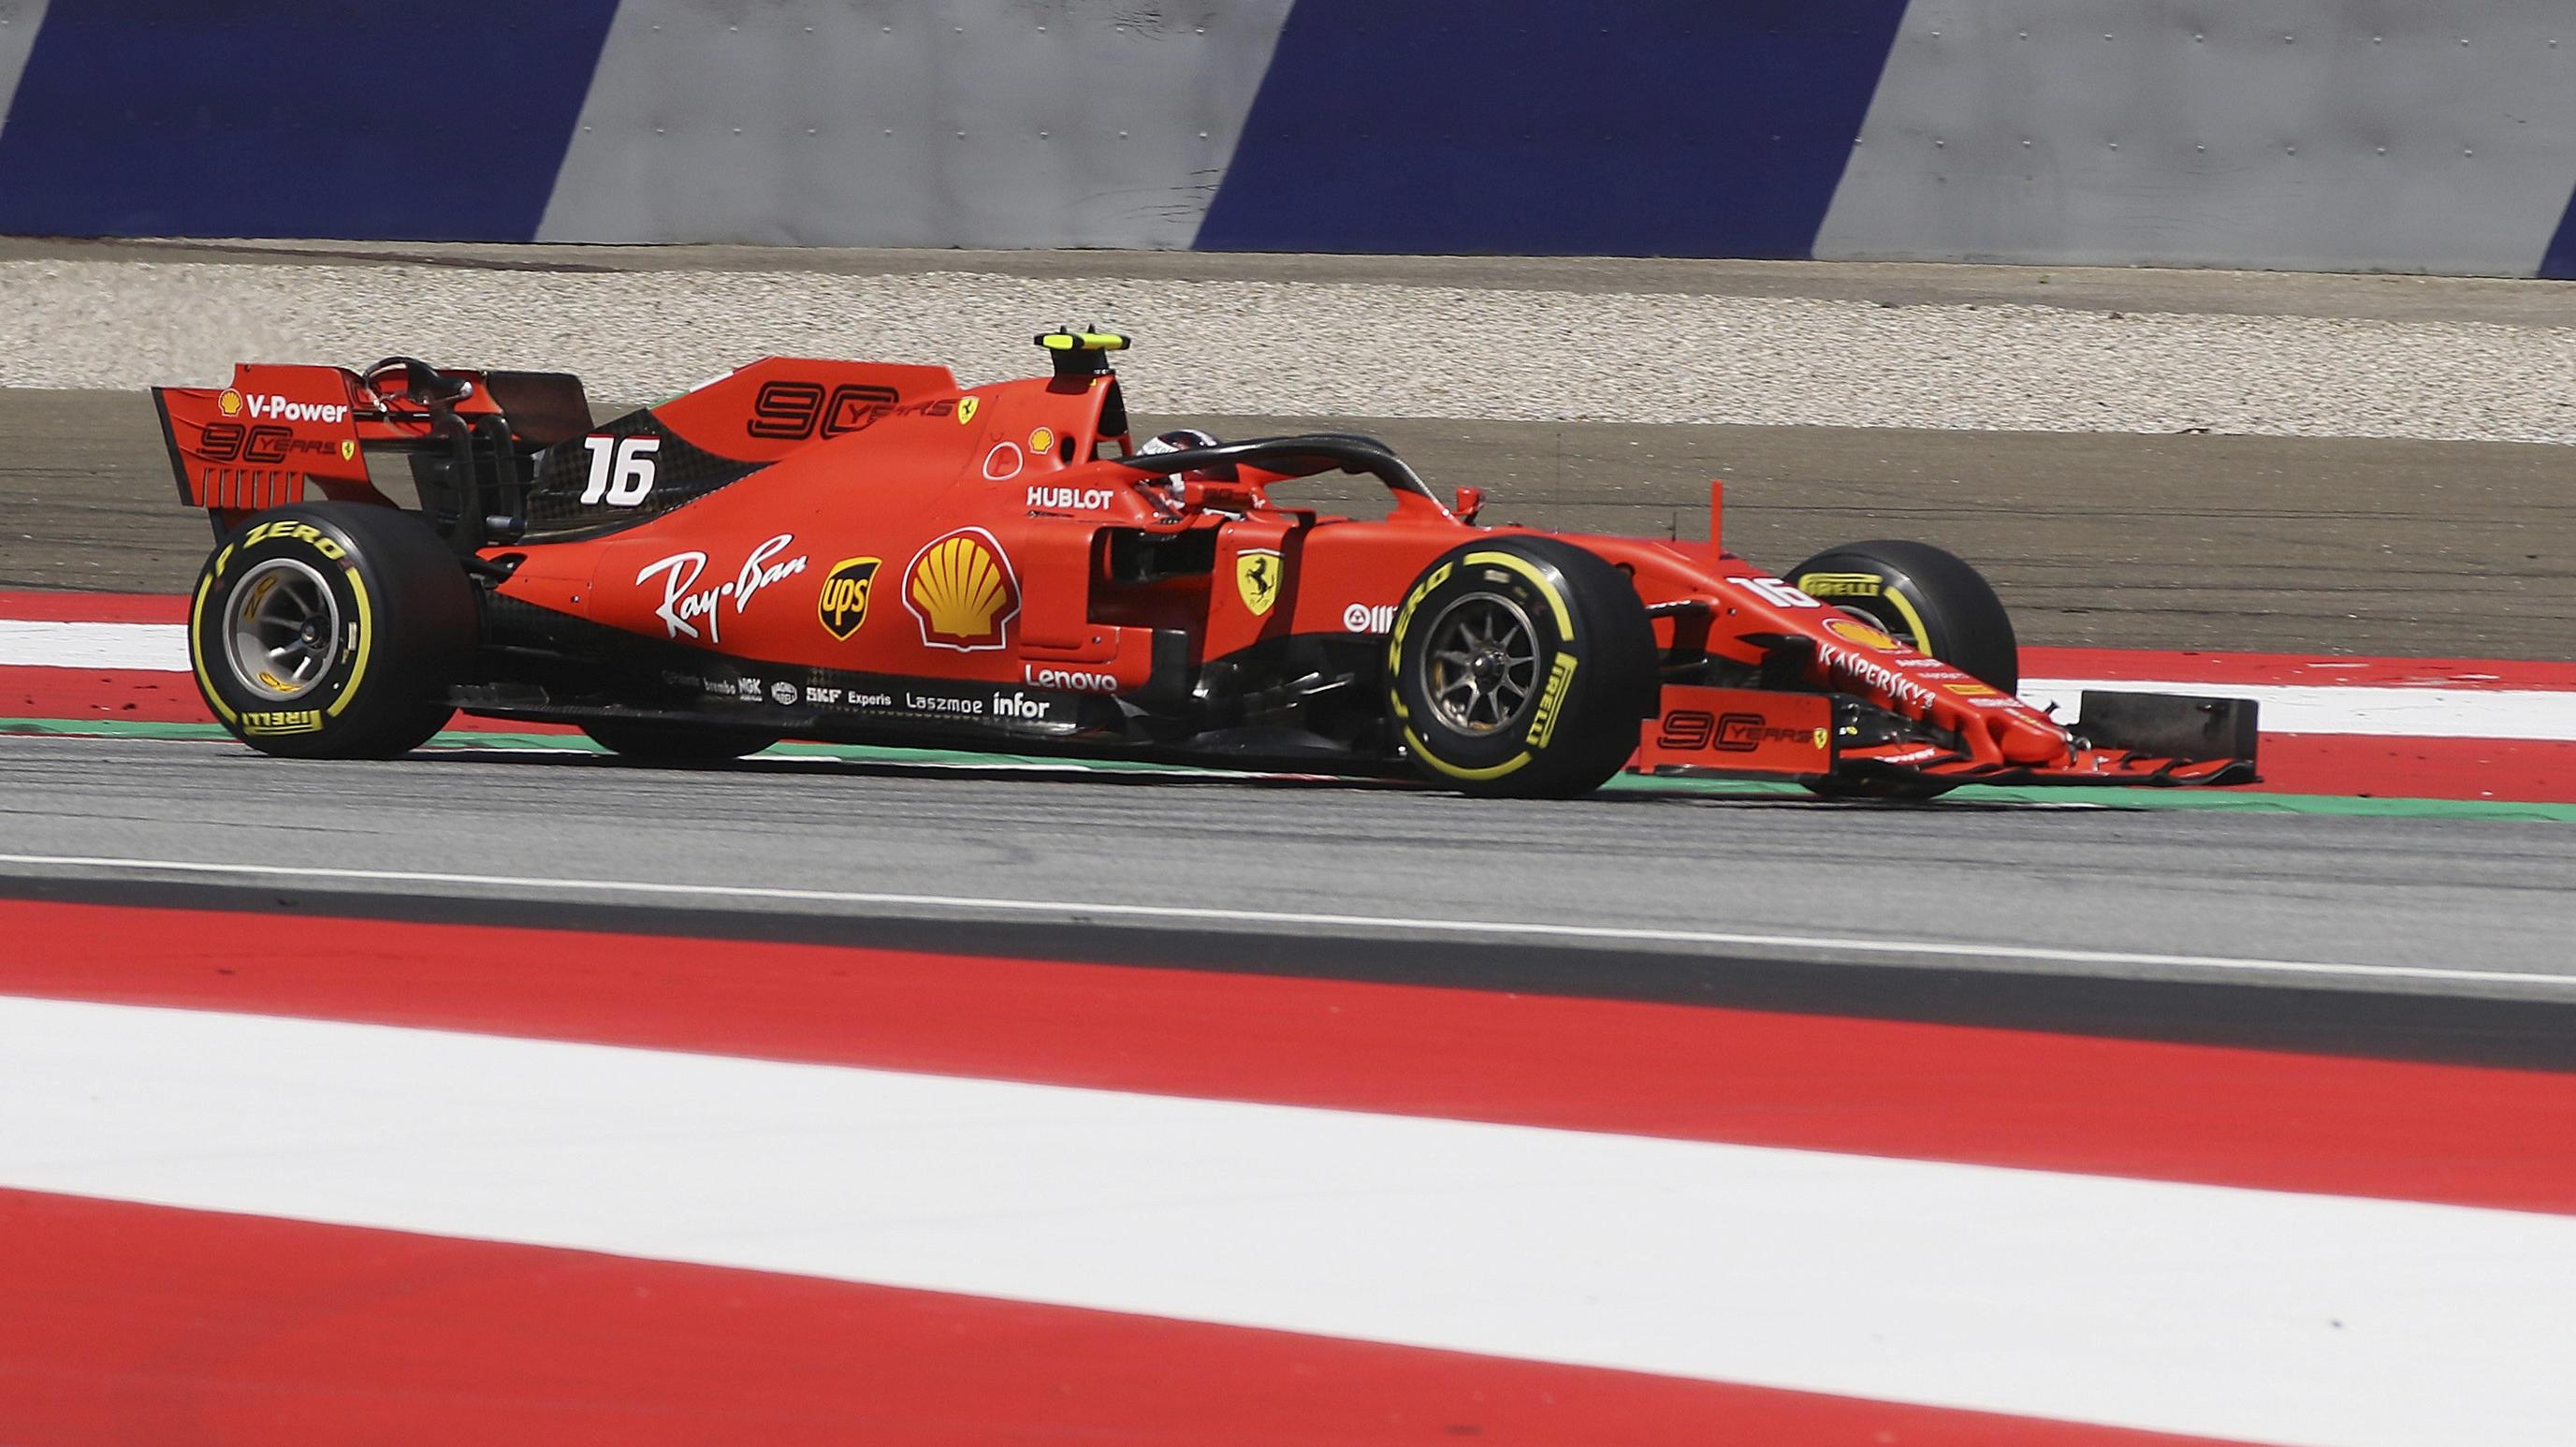 Formel 1 - cover